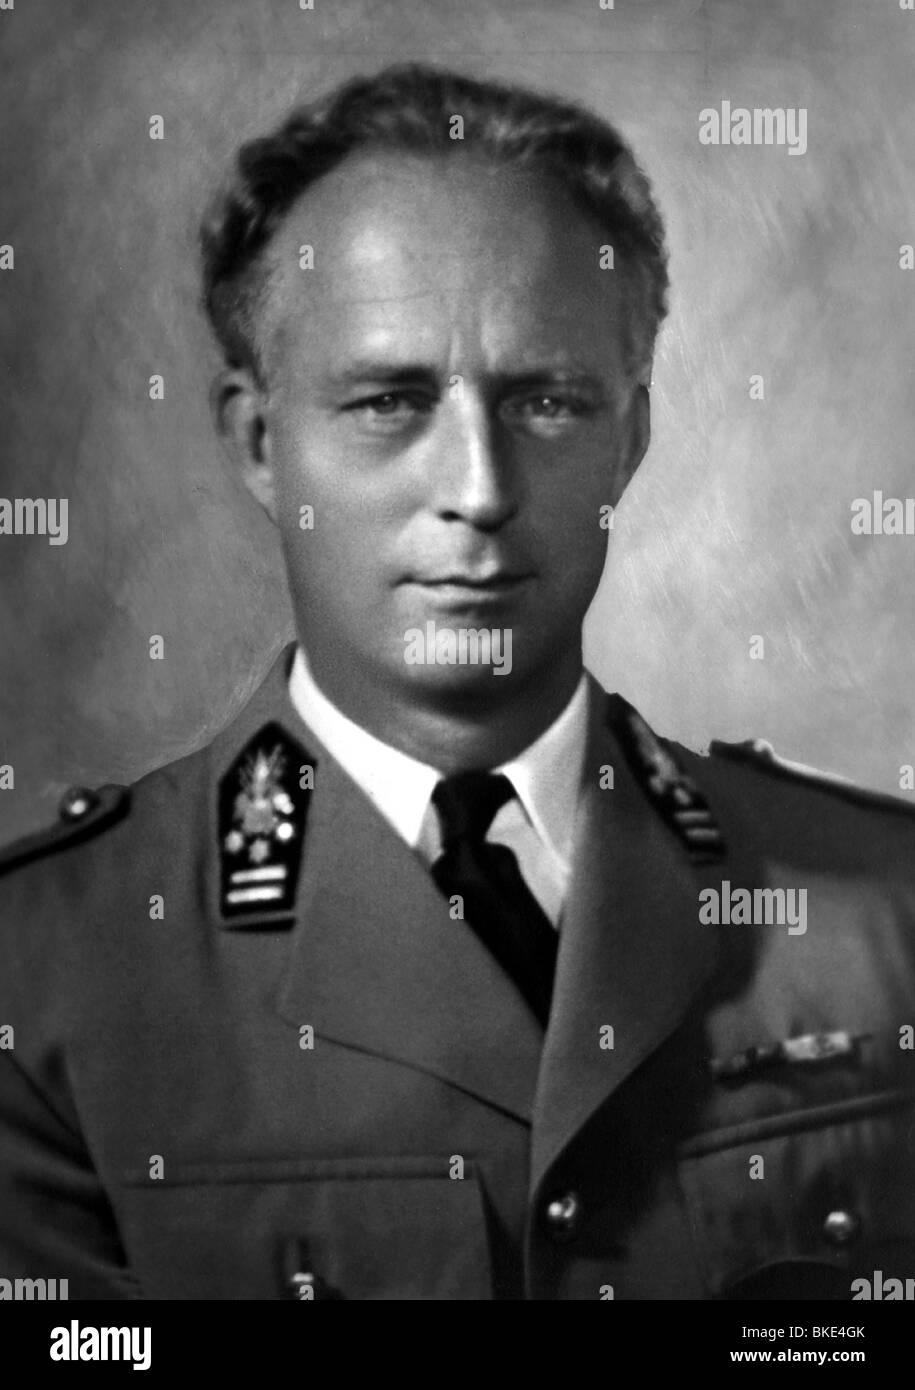 Leopold III, 3.11.1901 - 25.9.1983 King of Belgium 1934 - 1951, commander-in-chief of the Belgian army 1940, portrait Stock Photo